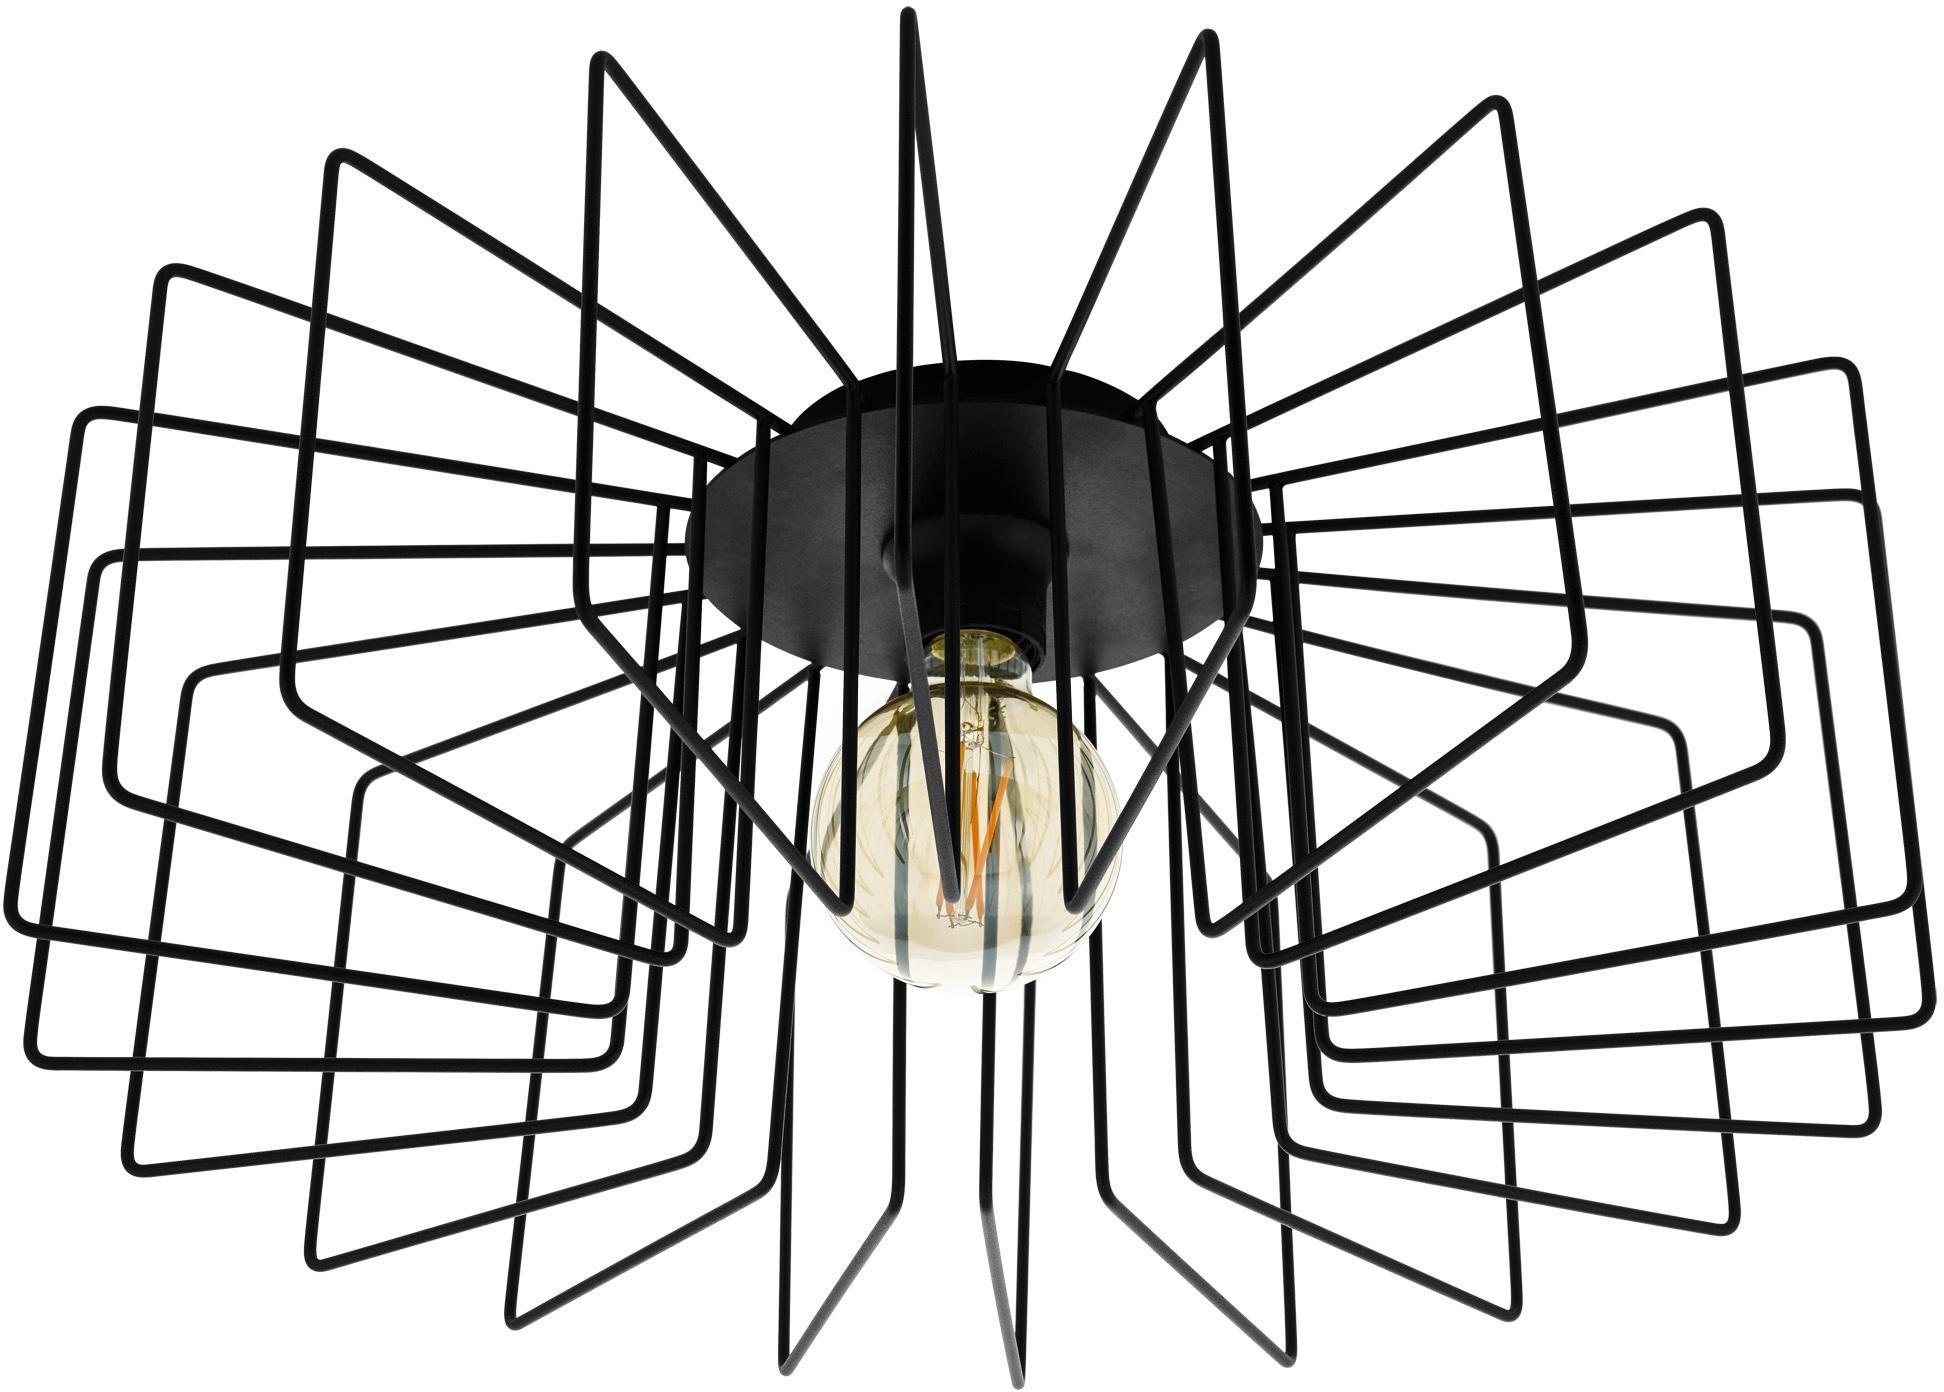 EGLO Deckenleuchte TREMEDAL, E27, Deckenlampe